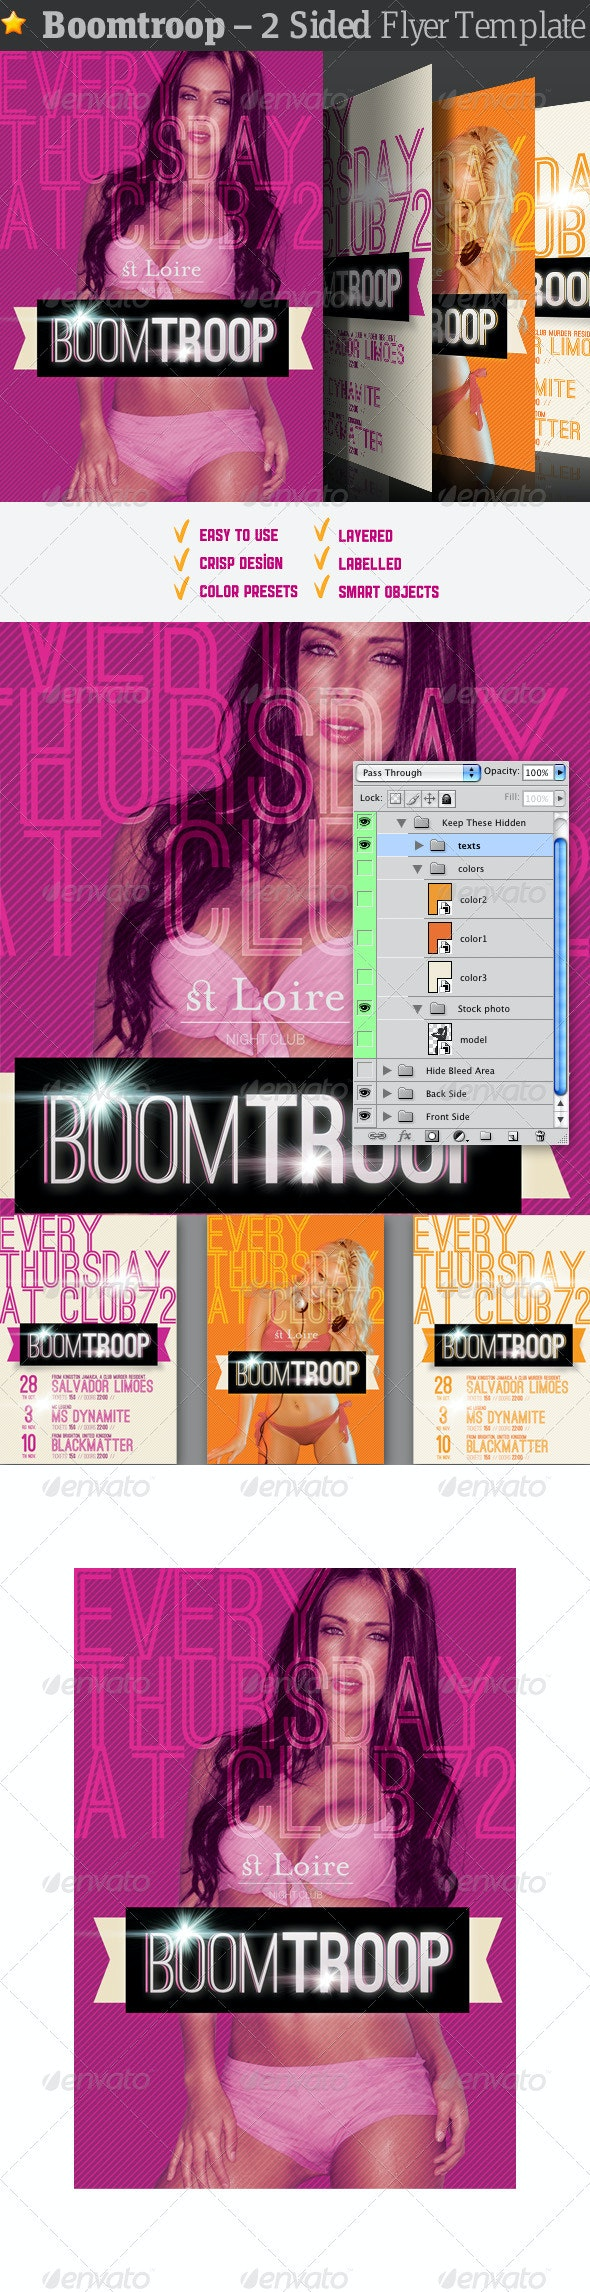 Boomtroop - Flyer Template - Clubs & Parties Events